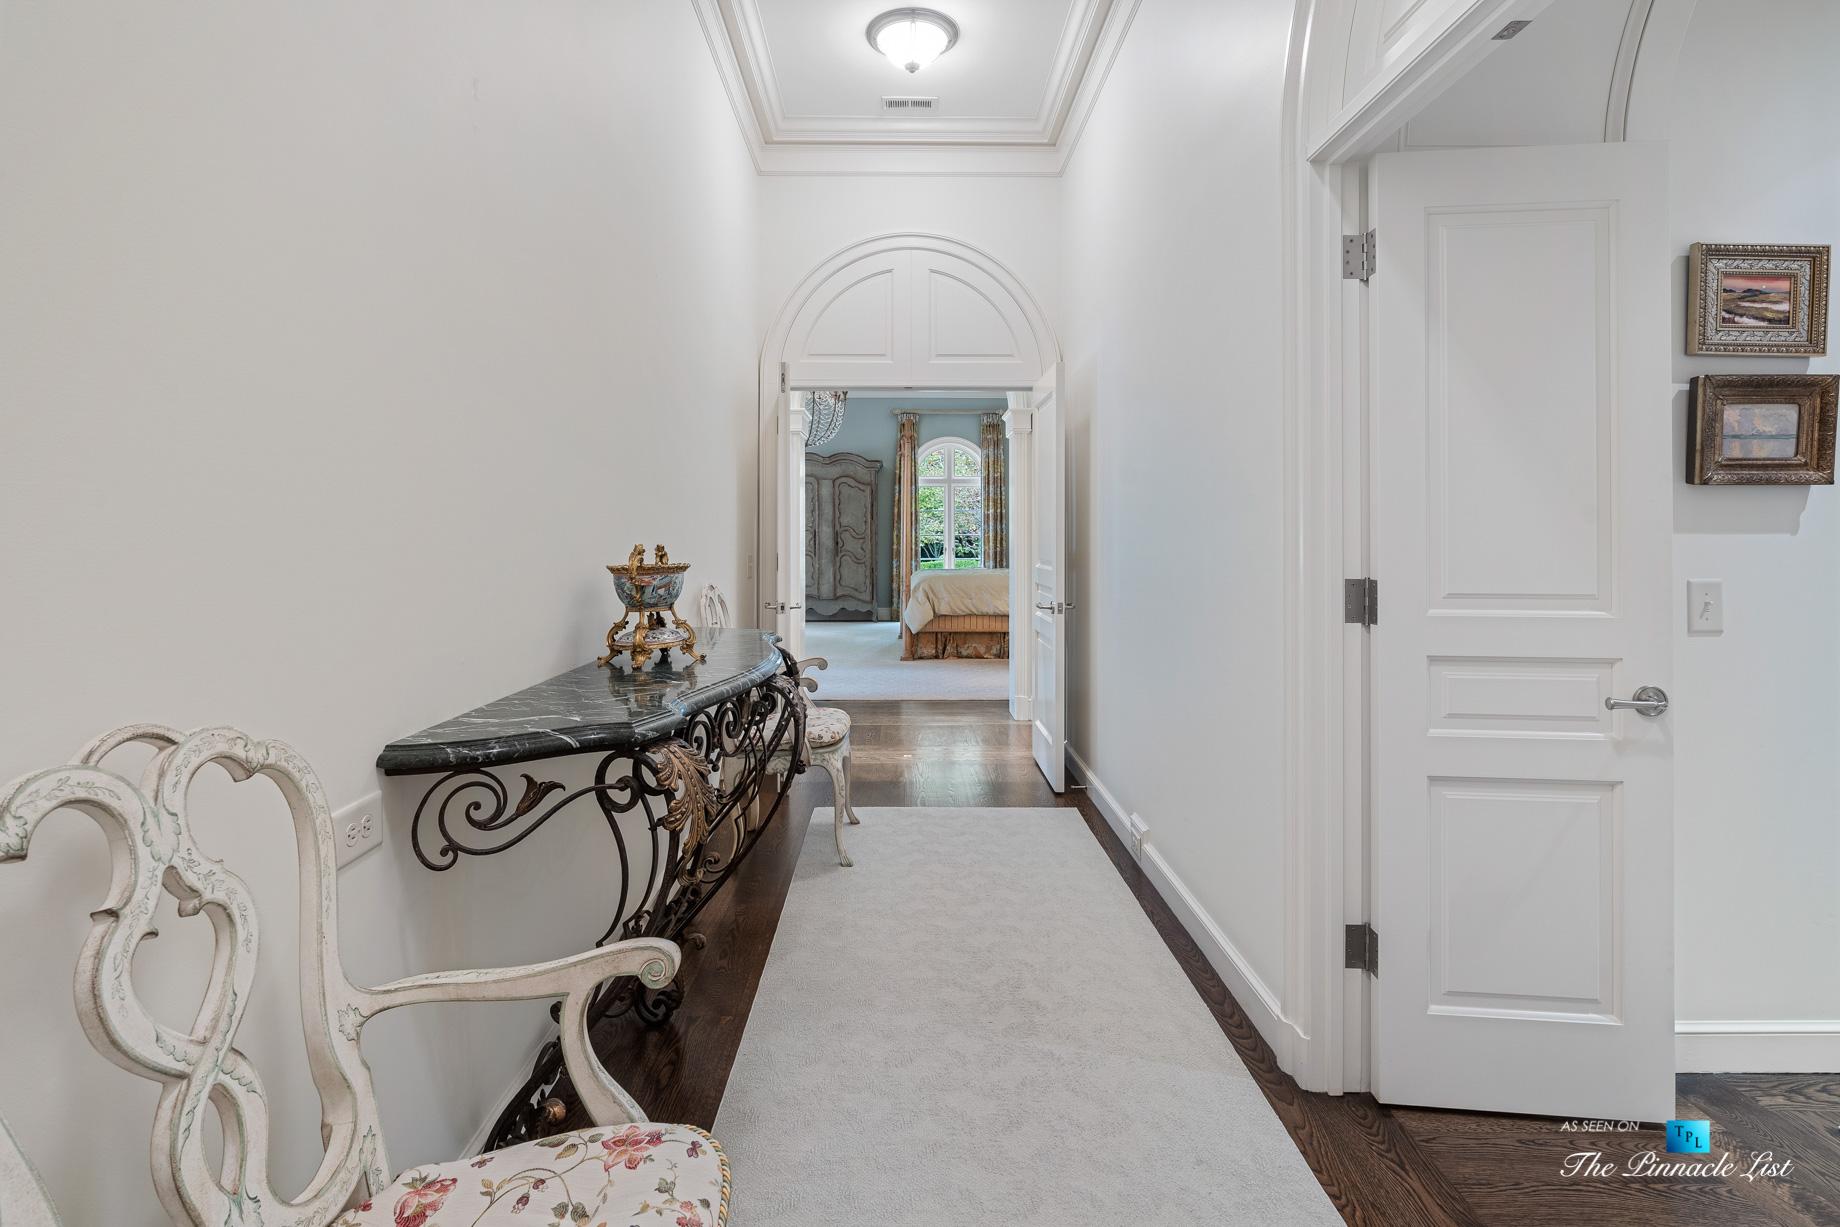 439 Blackland Rd NW, Atlanta, GA, USA - Hallway - Luxury Real Estate - Tuxedo Park Mediterranean Mansion Home